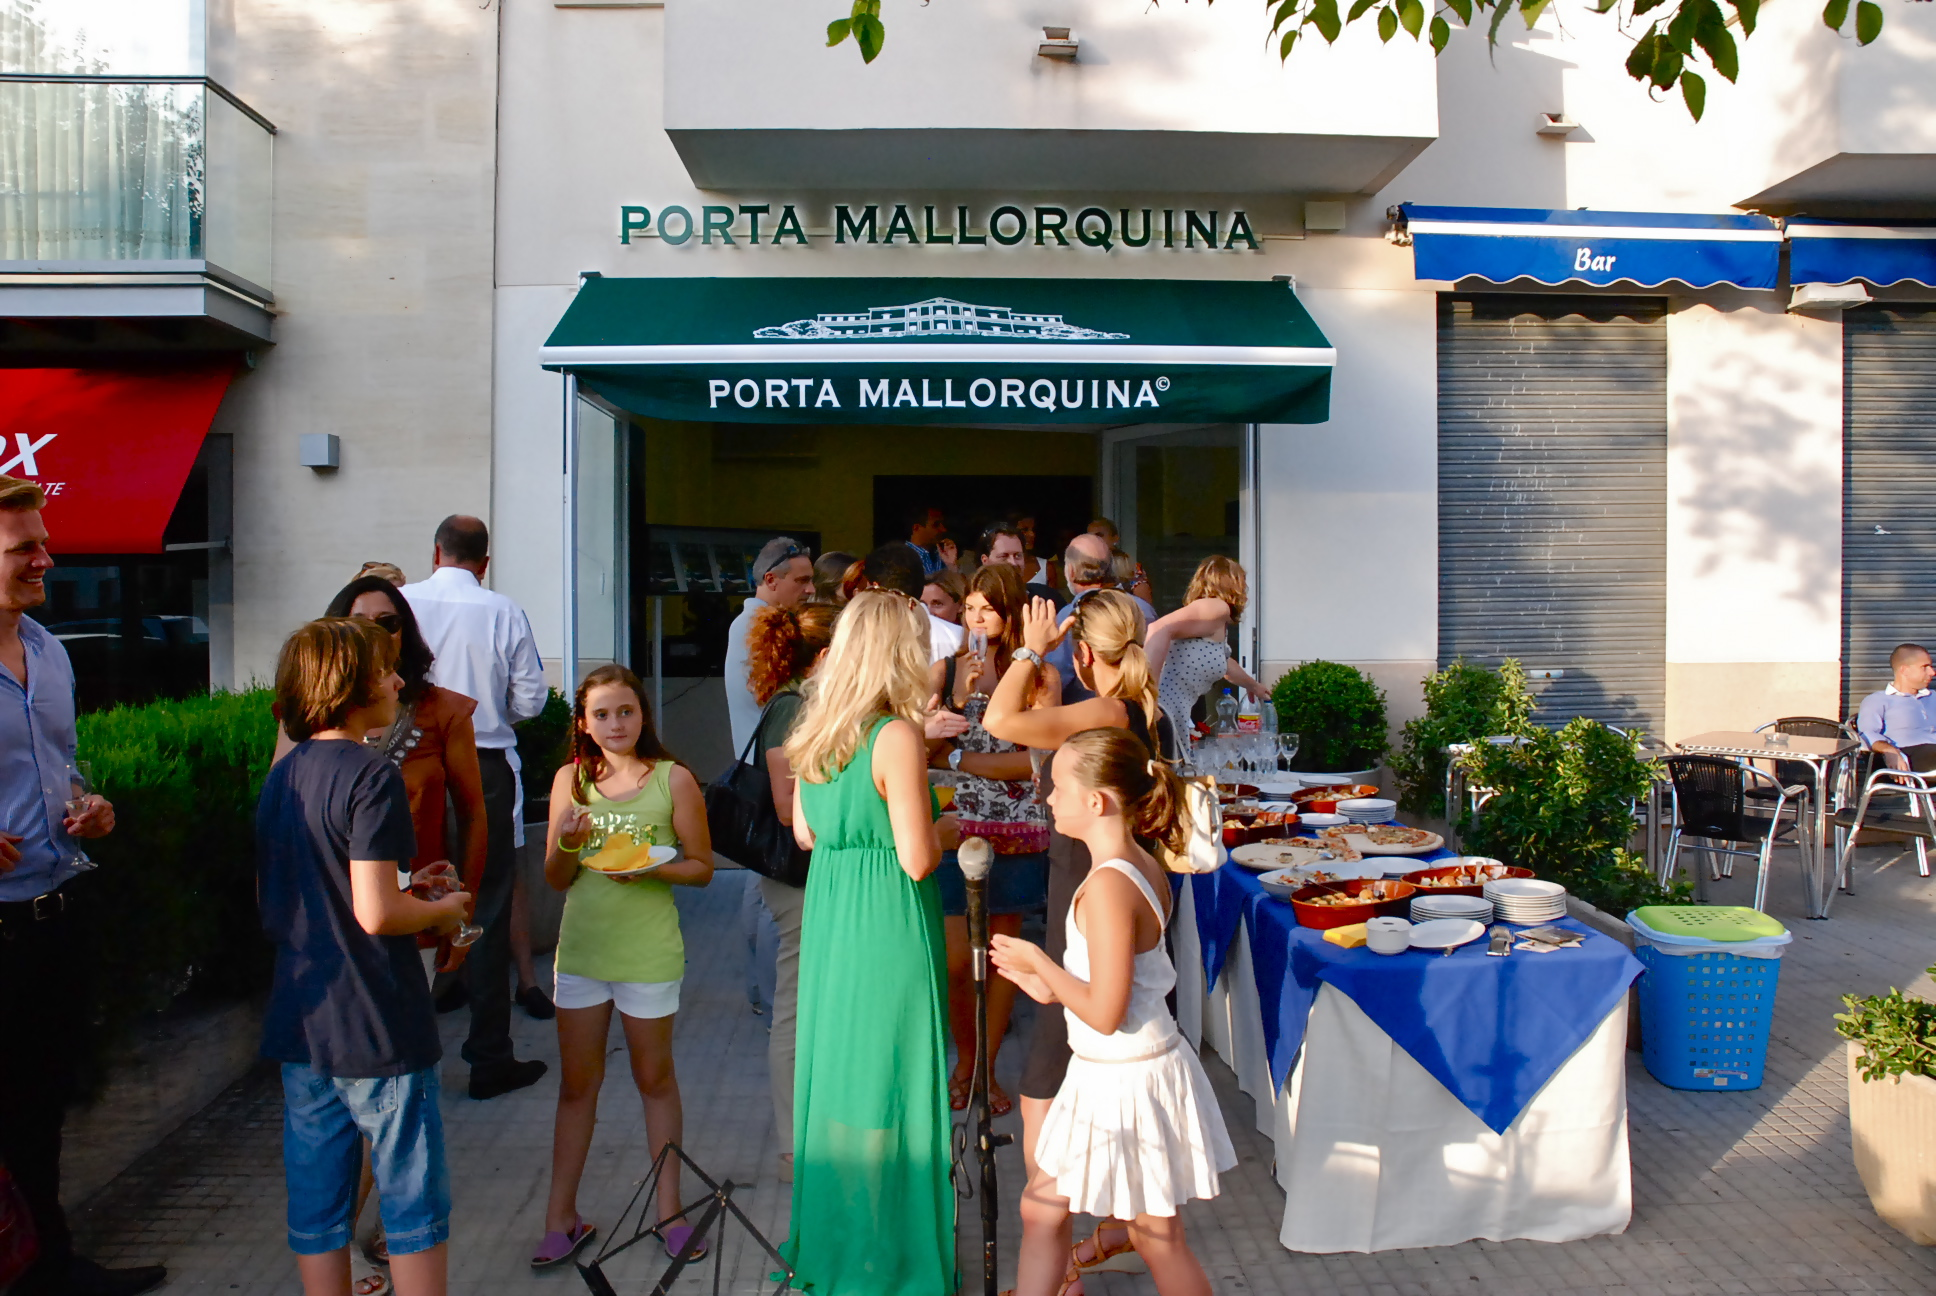 Am 16. August eröffnete Porta Mallorquina in Pollensa den achten Standort.